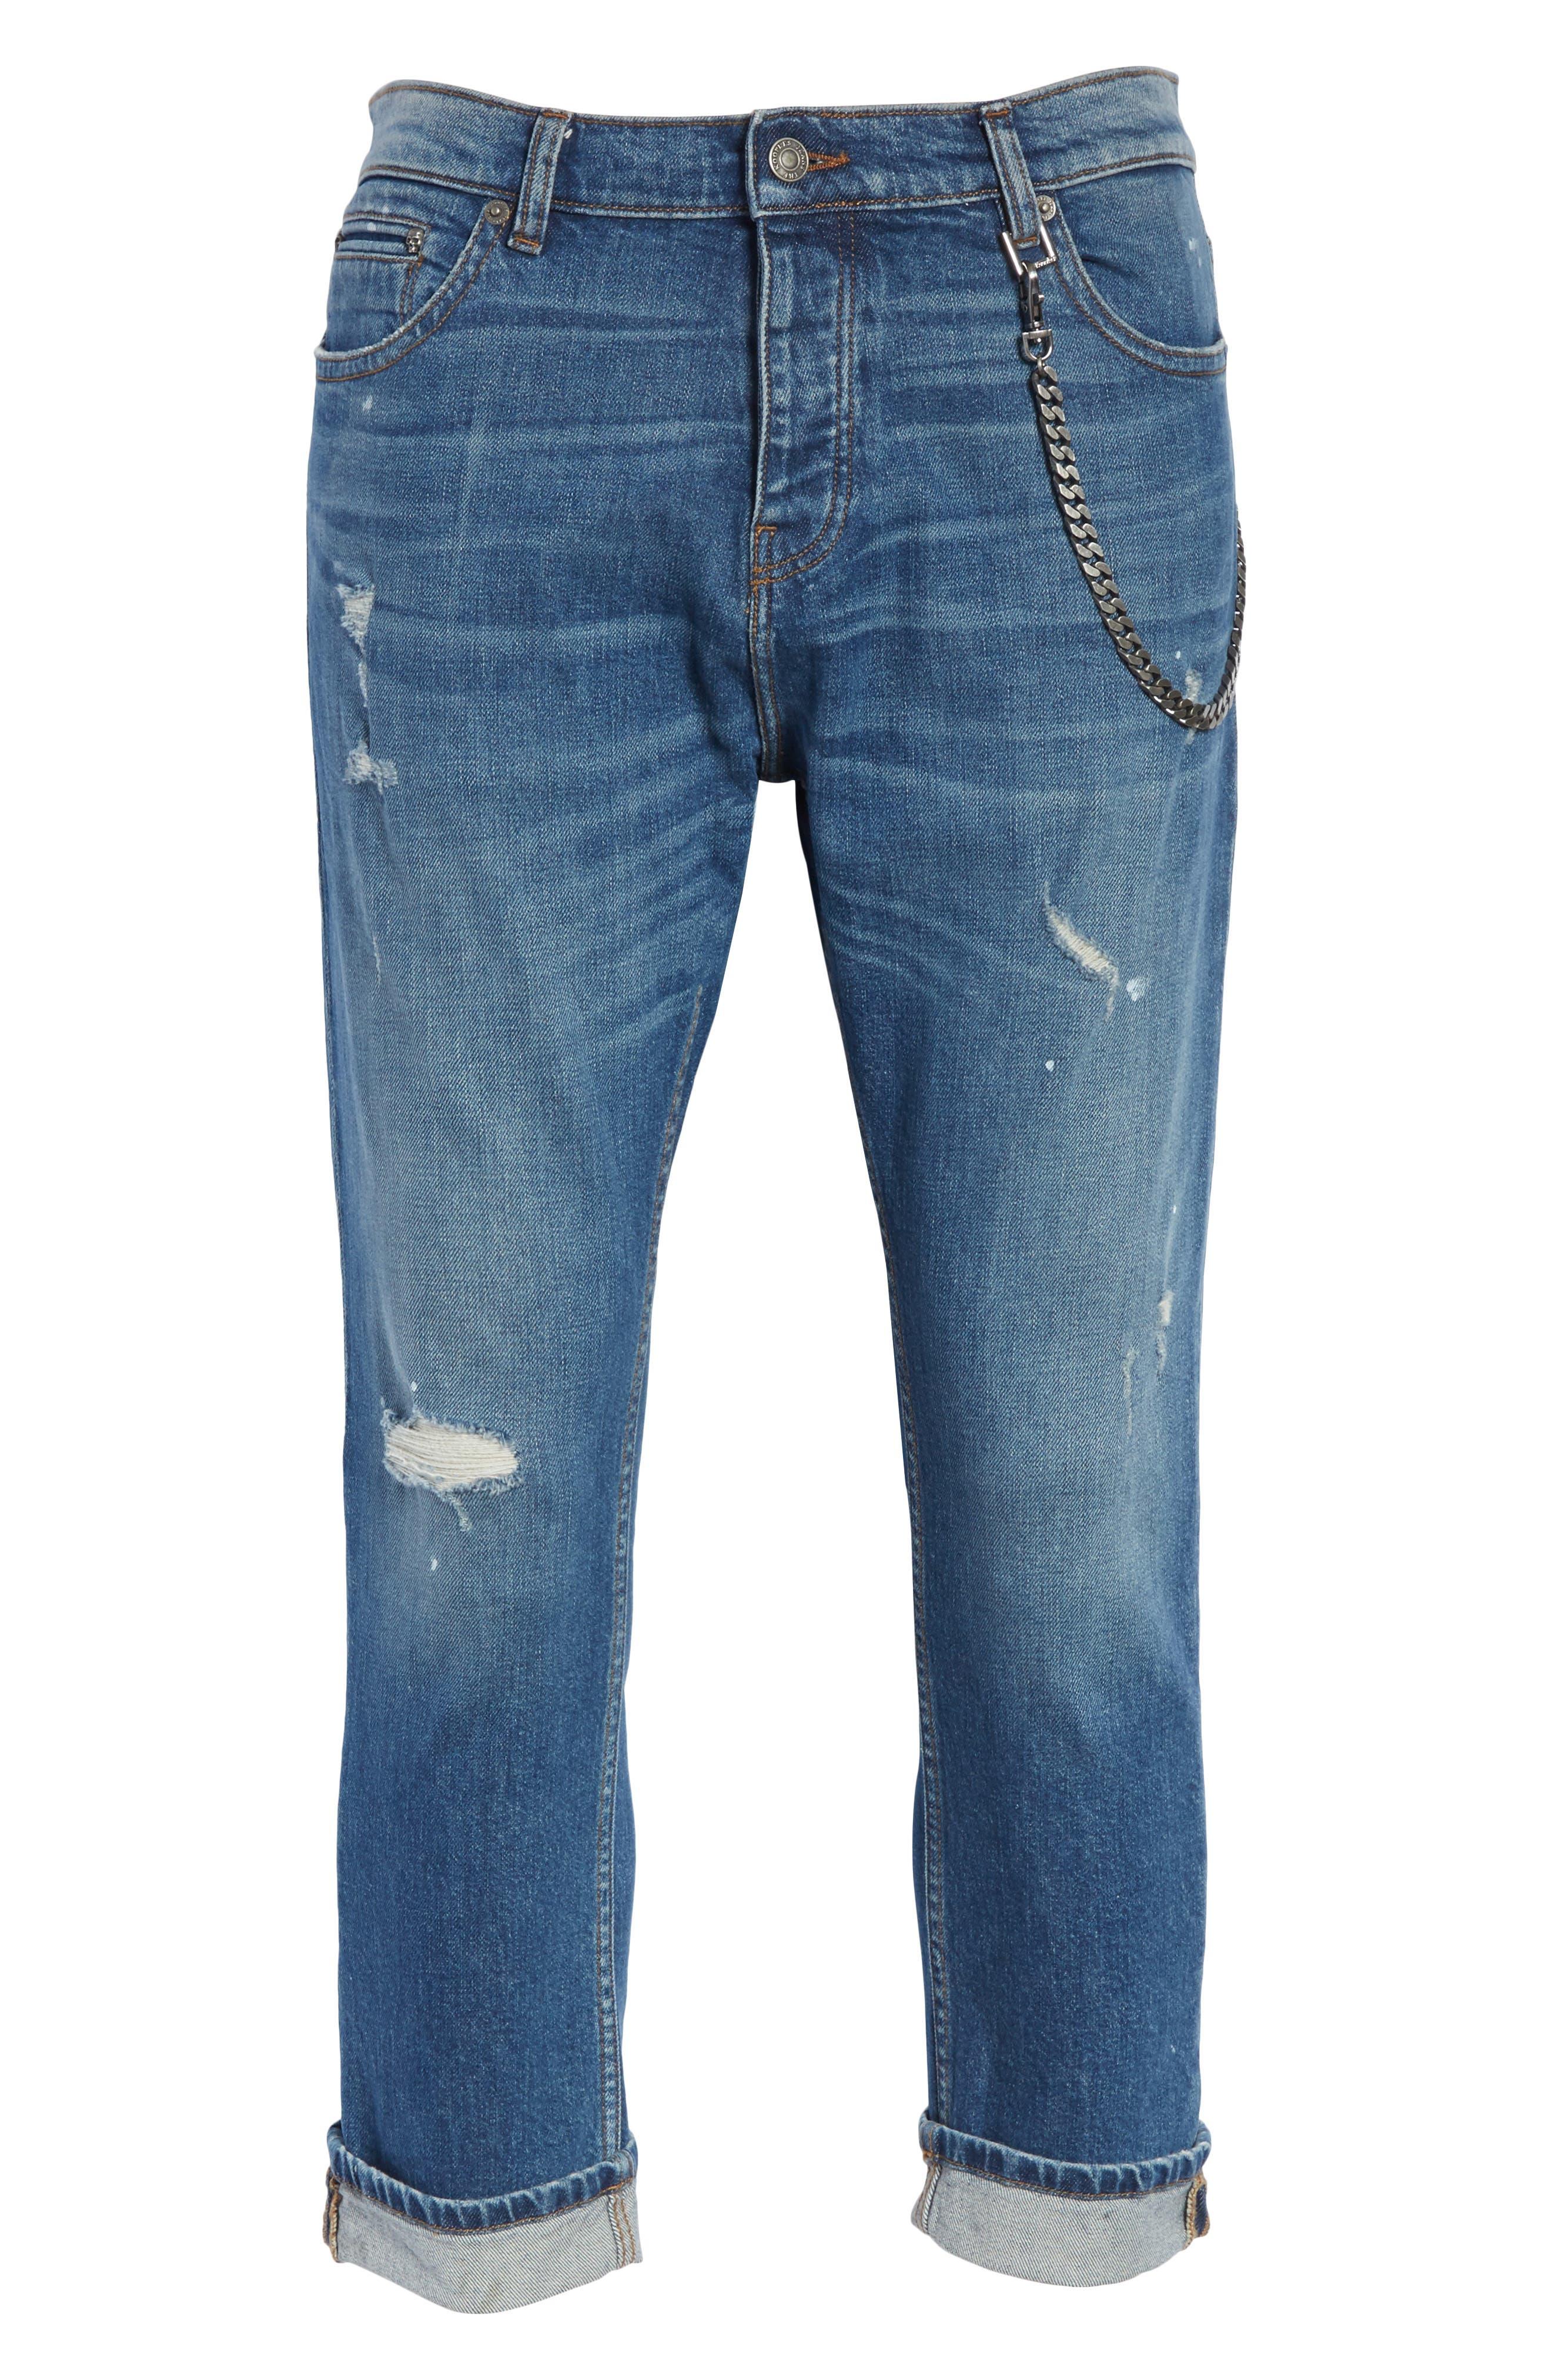 Cropped Jeans,                             Alternate thumbnail 6, color,                             Blue